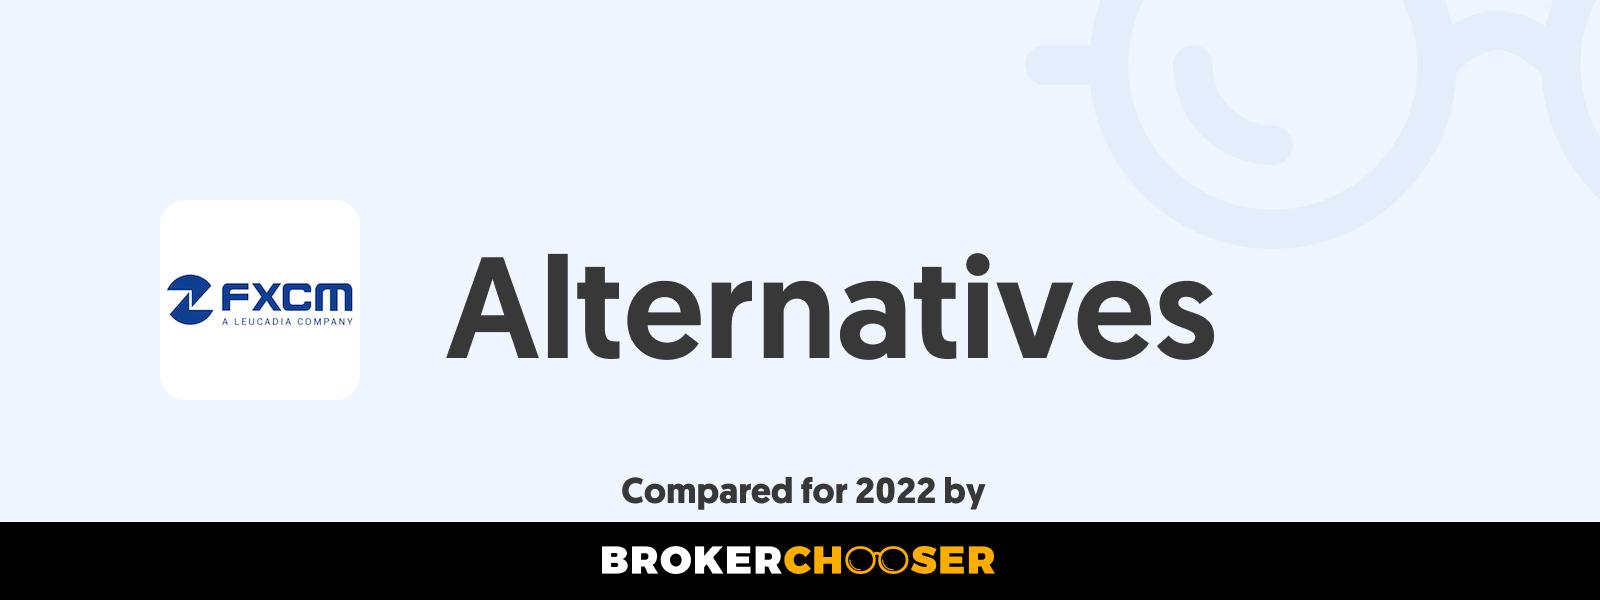 FXCM Alternatives